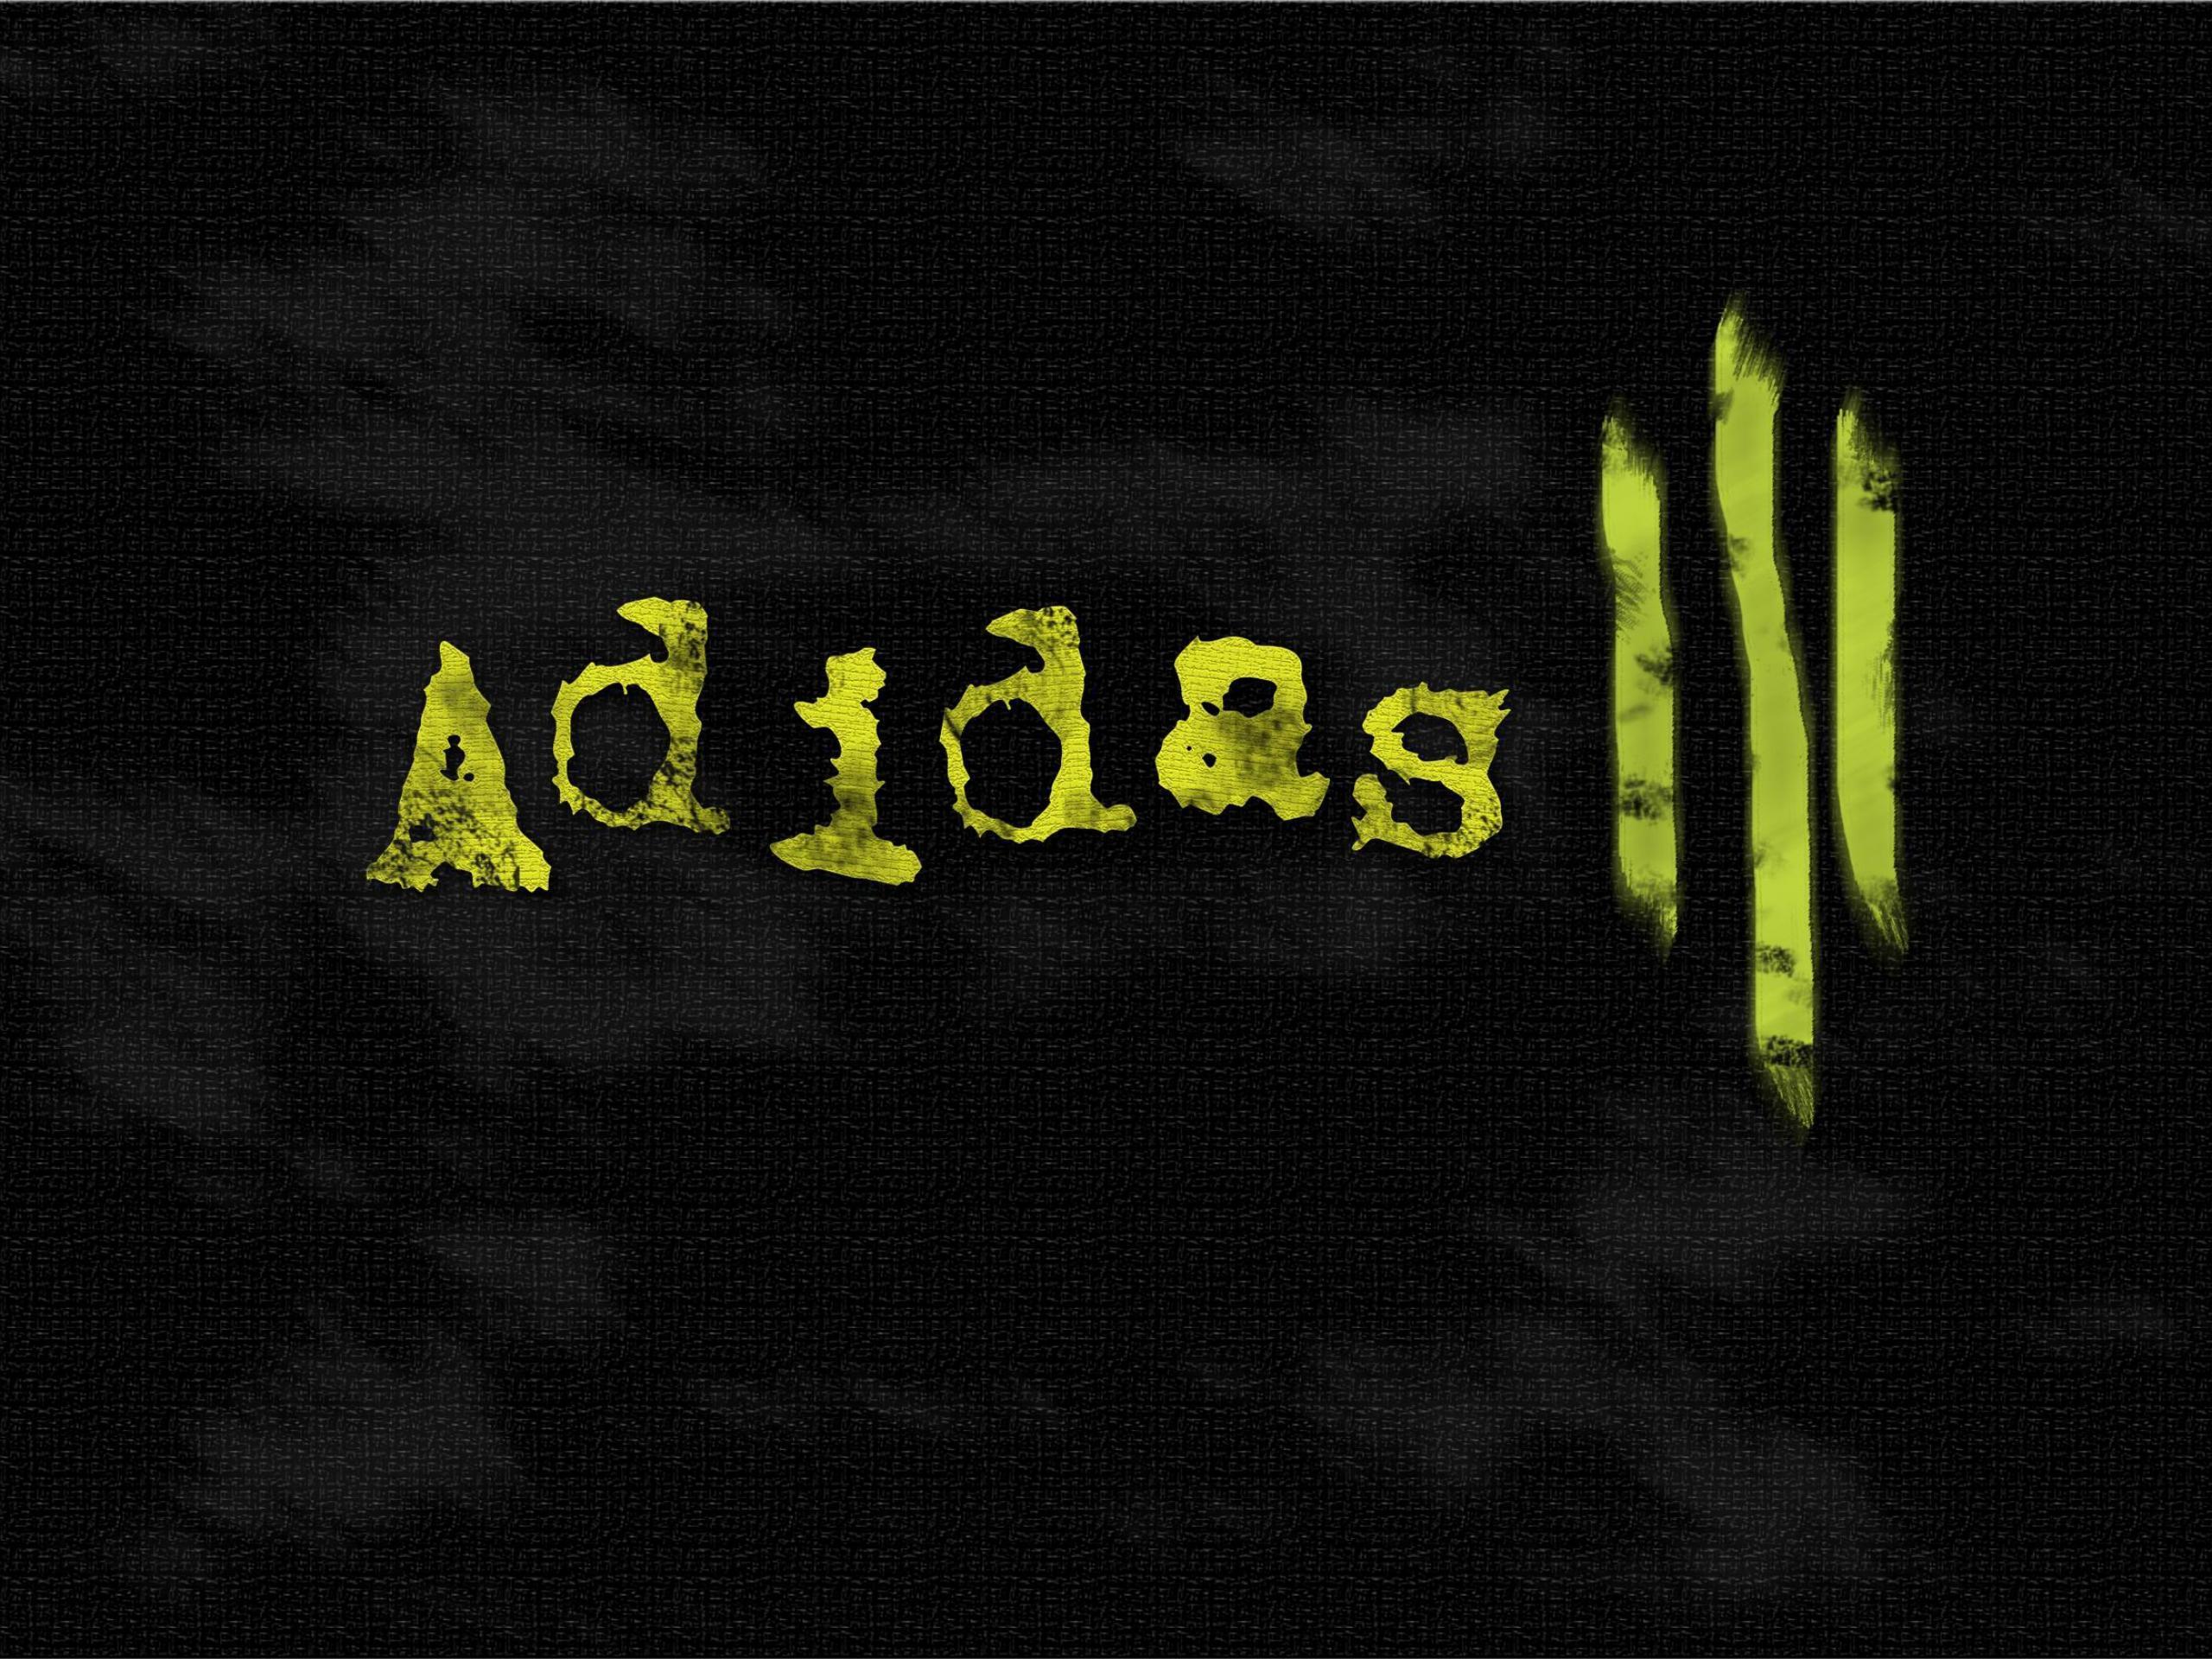 Adidas Wallpaper · Download